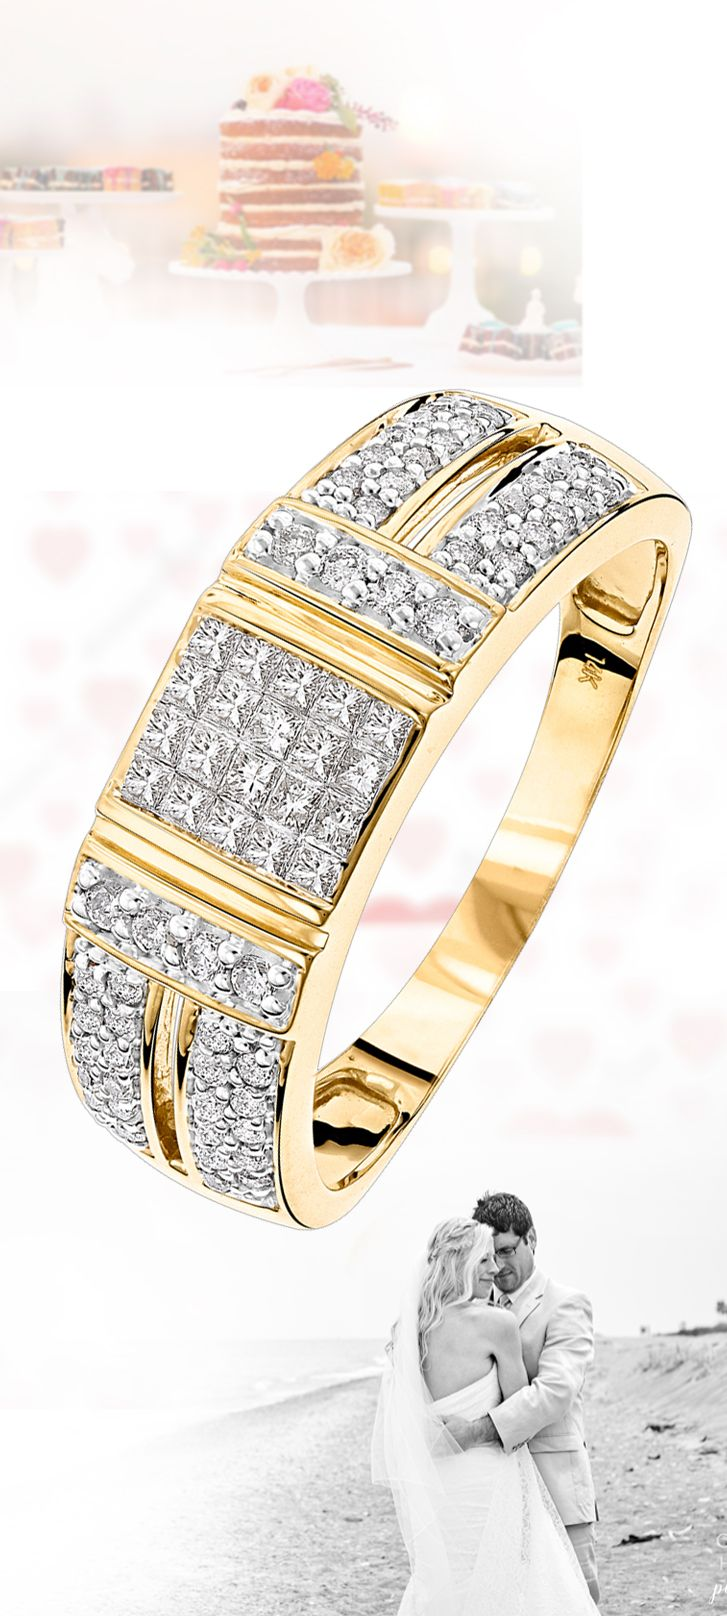 mens wedding ring law enforcement wedding bands 14K Gold Diamond Ring w Round Princess Diamonds 0 85ct